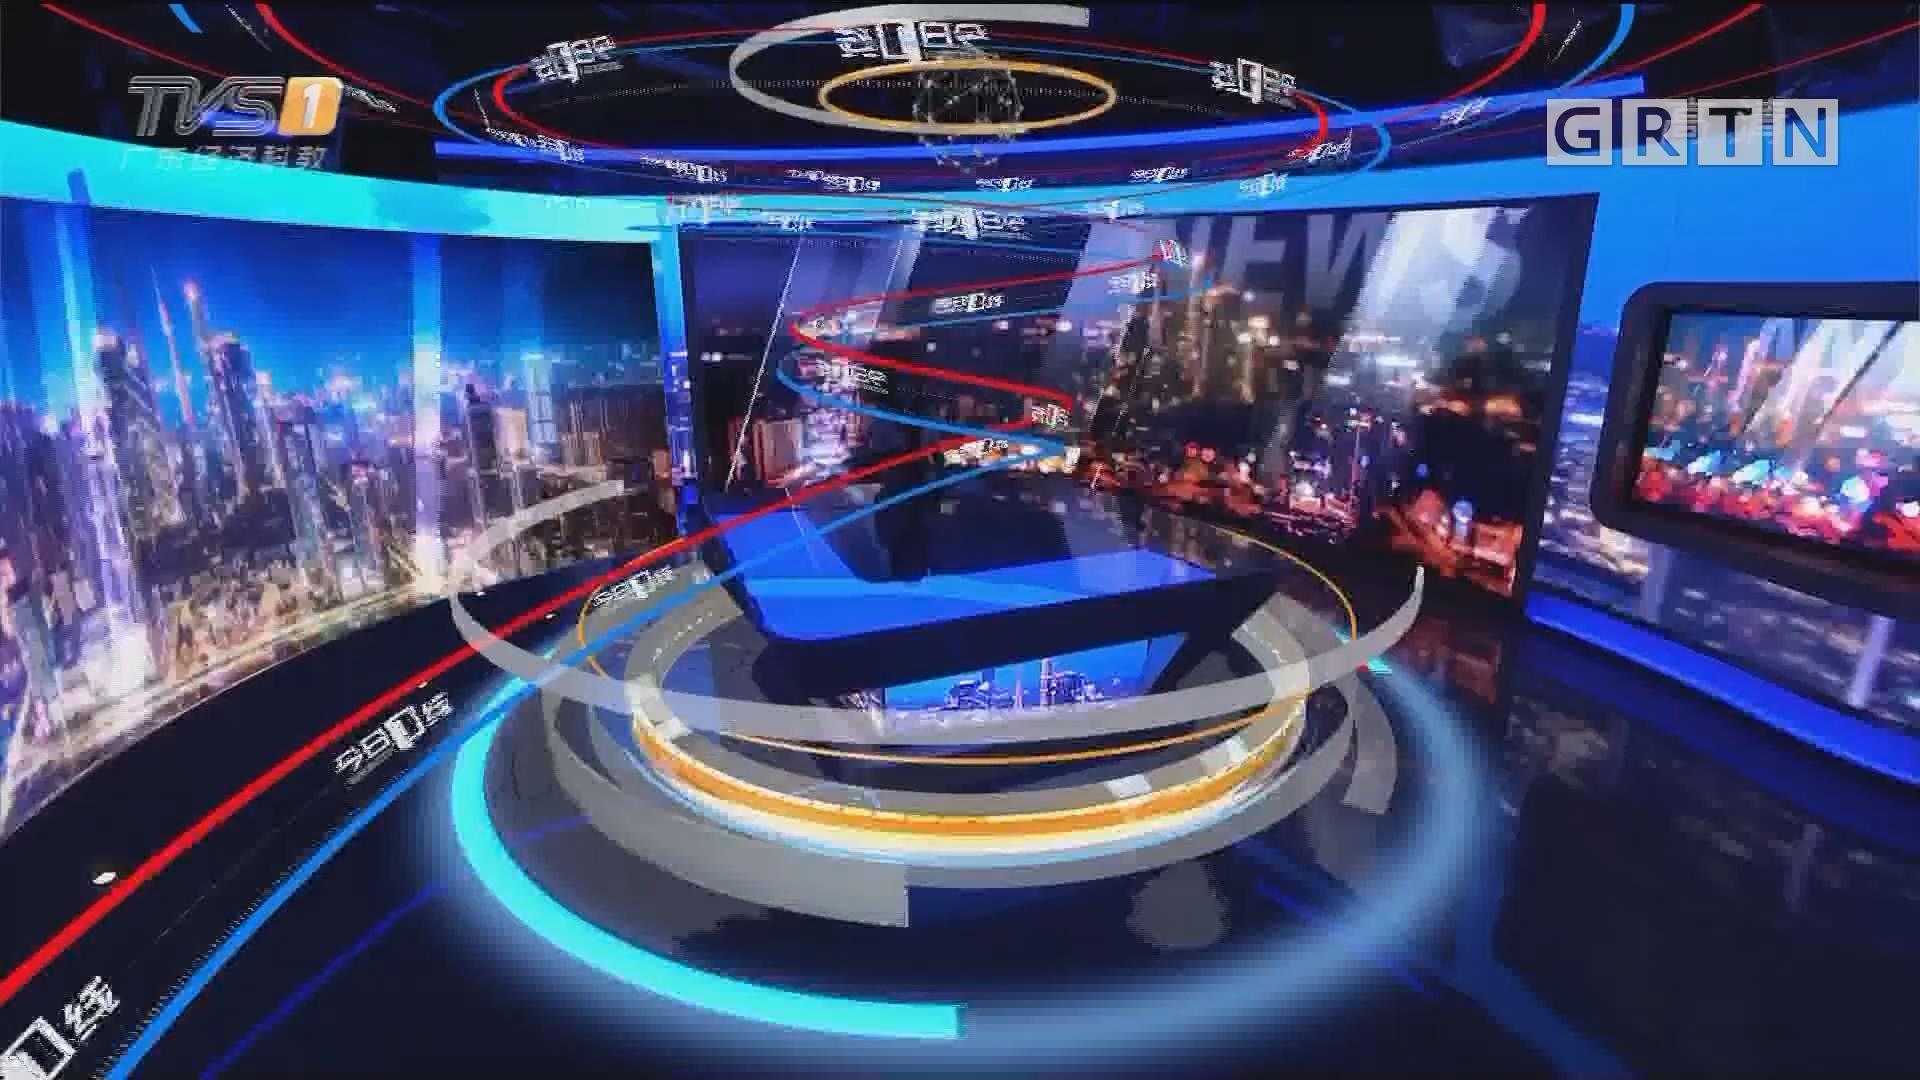 [HD][2019-05-14]今日一线:云浮云安:民居爆炸坍塌一死一失联 消防紧急搜救